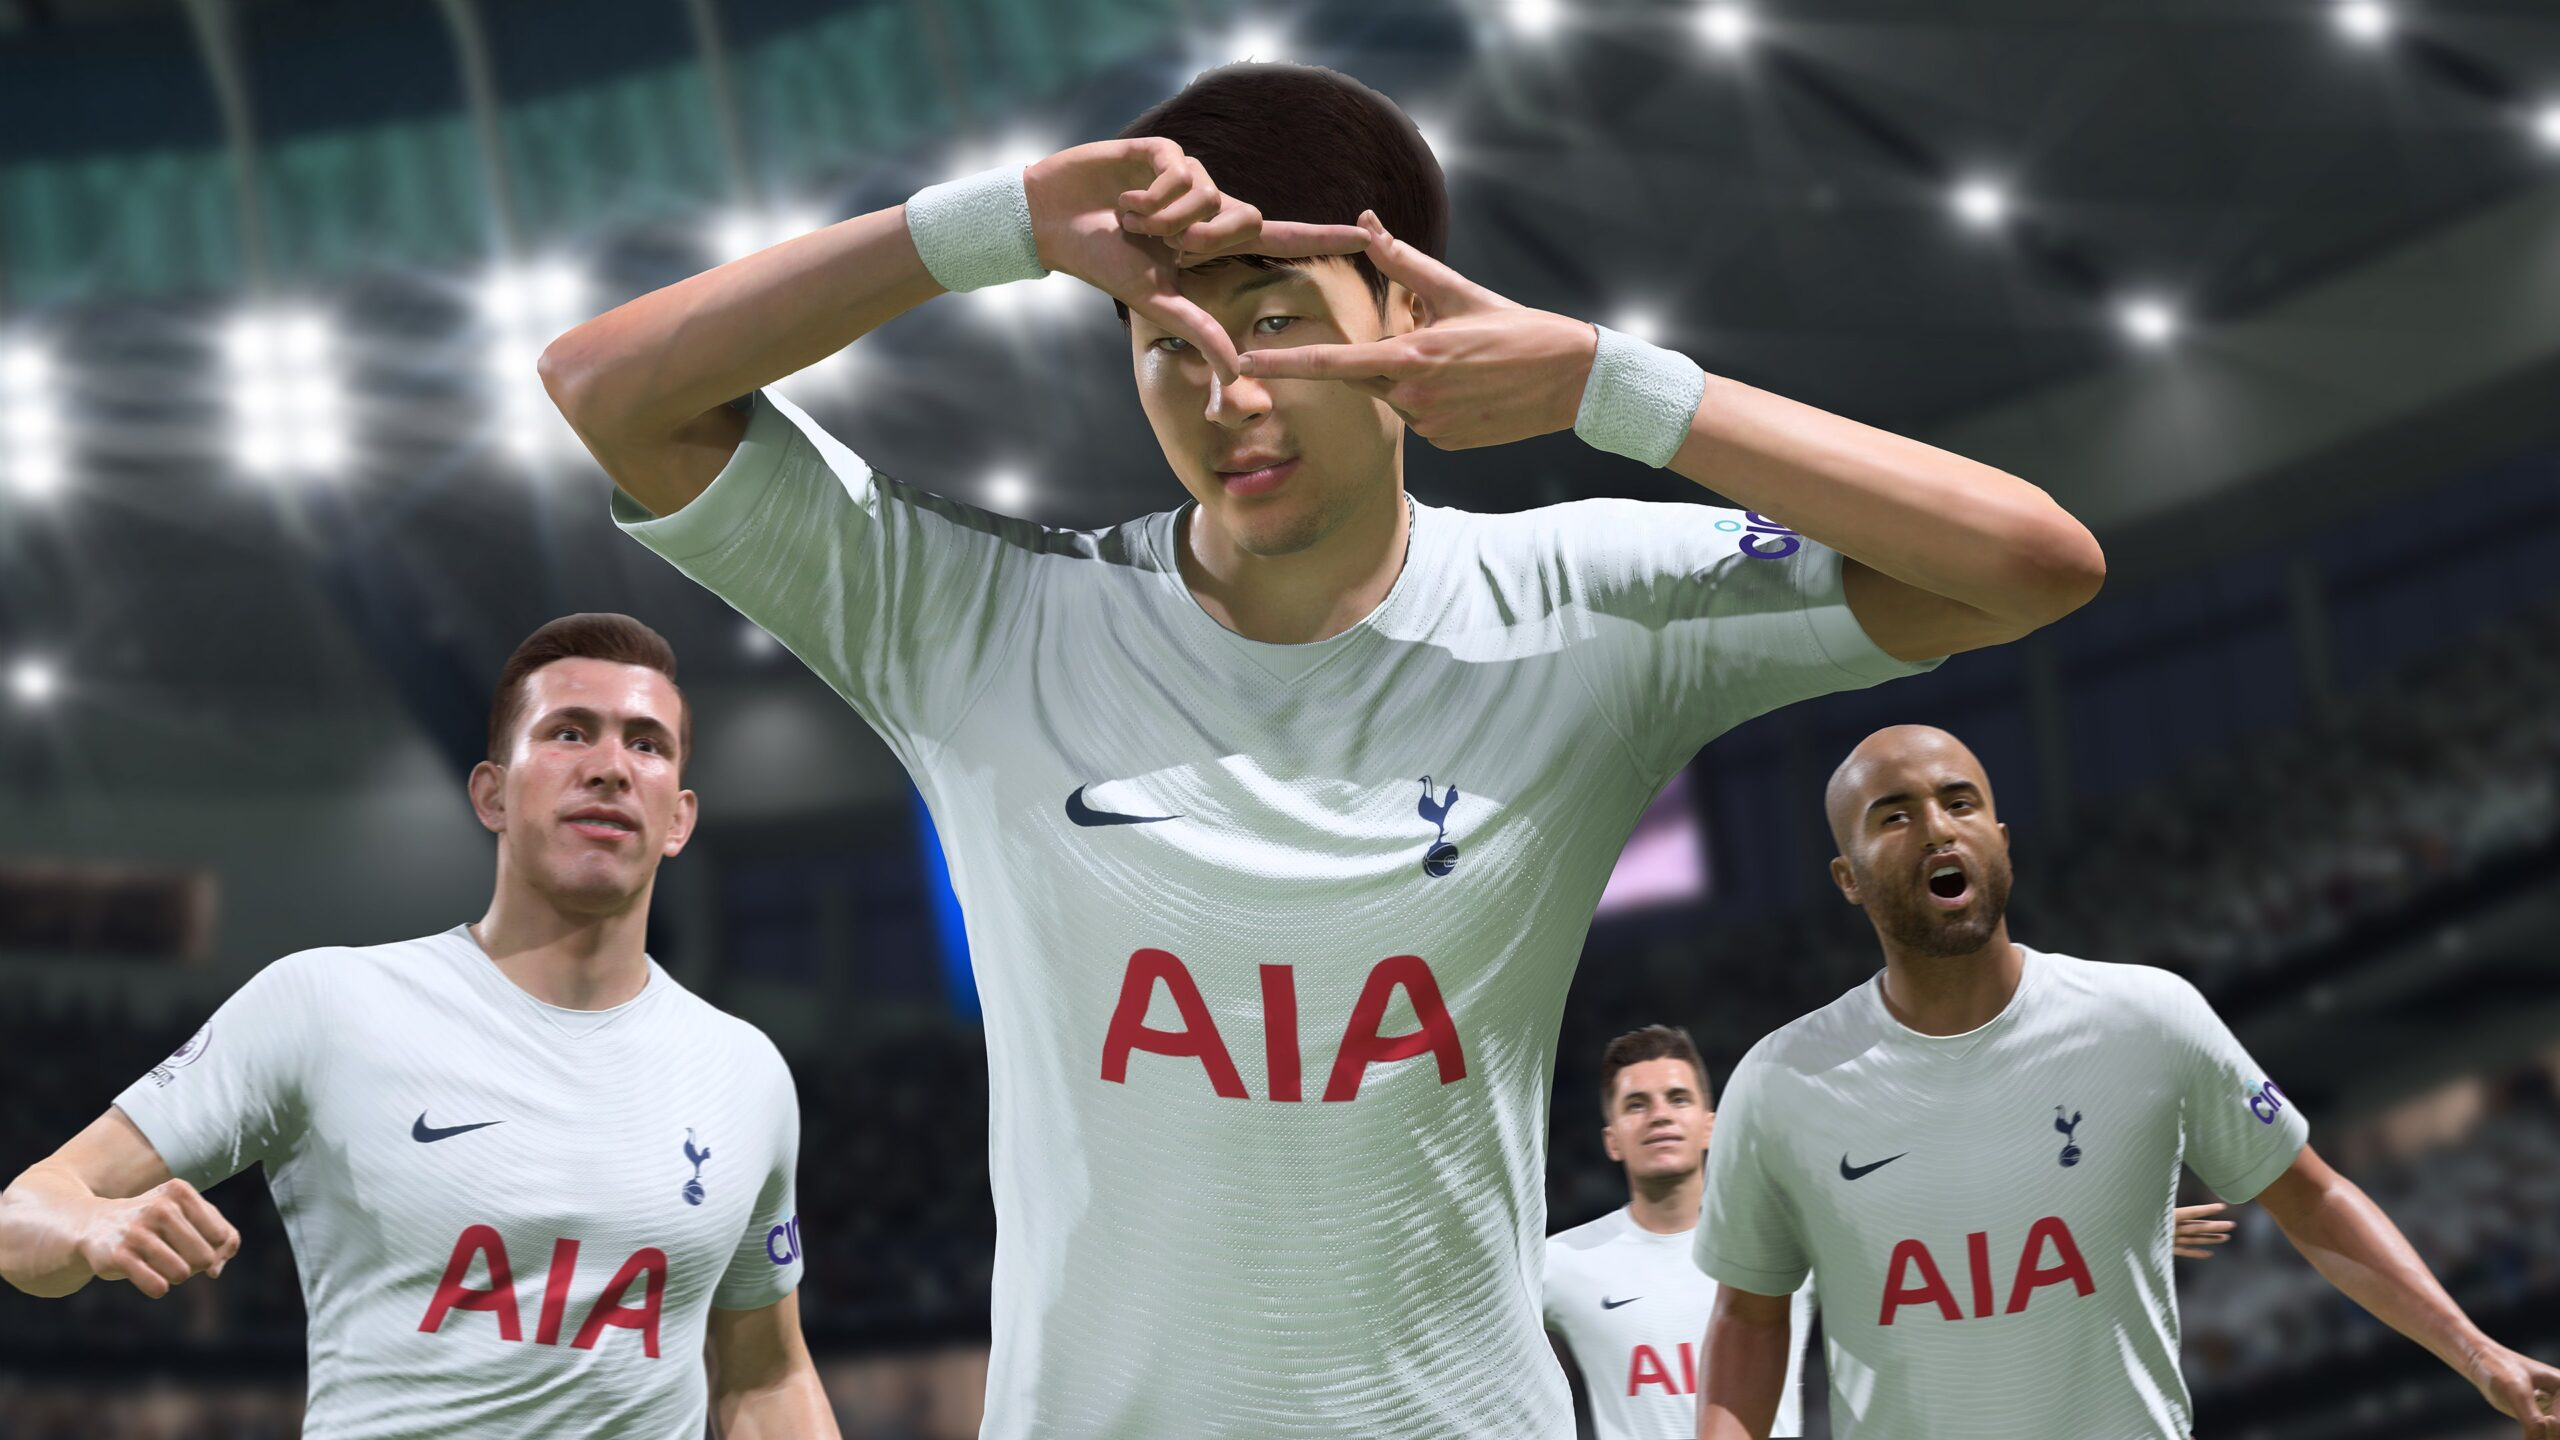 Пробная версия FIFA 22 станет доступна в Game Pass Ultimate завтра в 20:00 по МСК